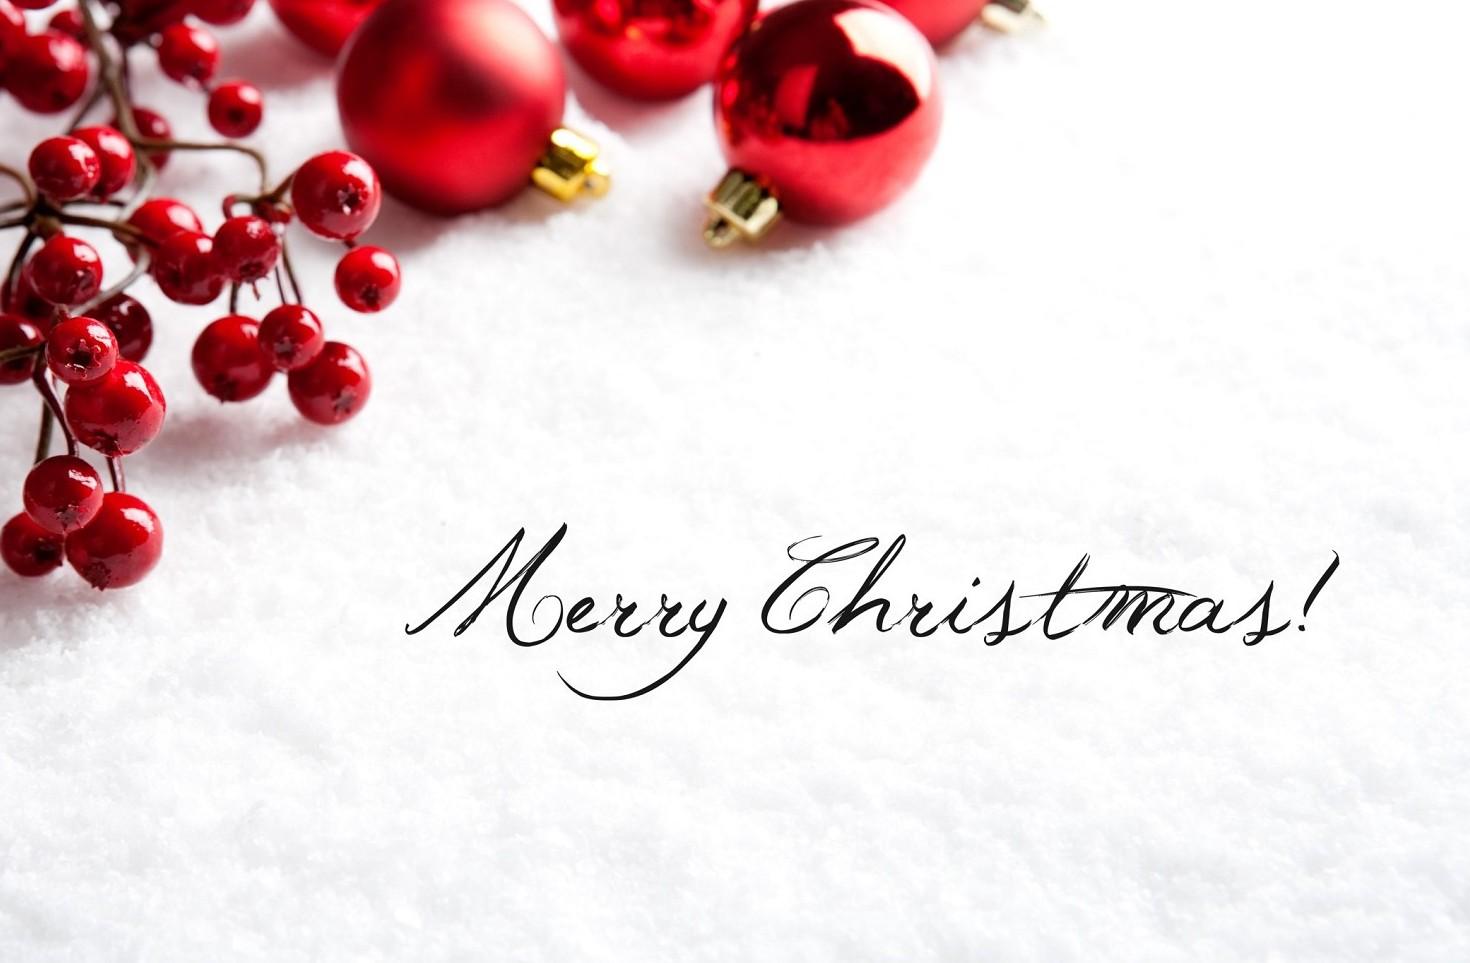 Frasi Auguri di Natale originali e sorpr